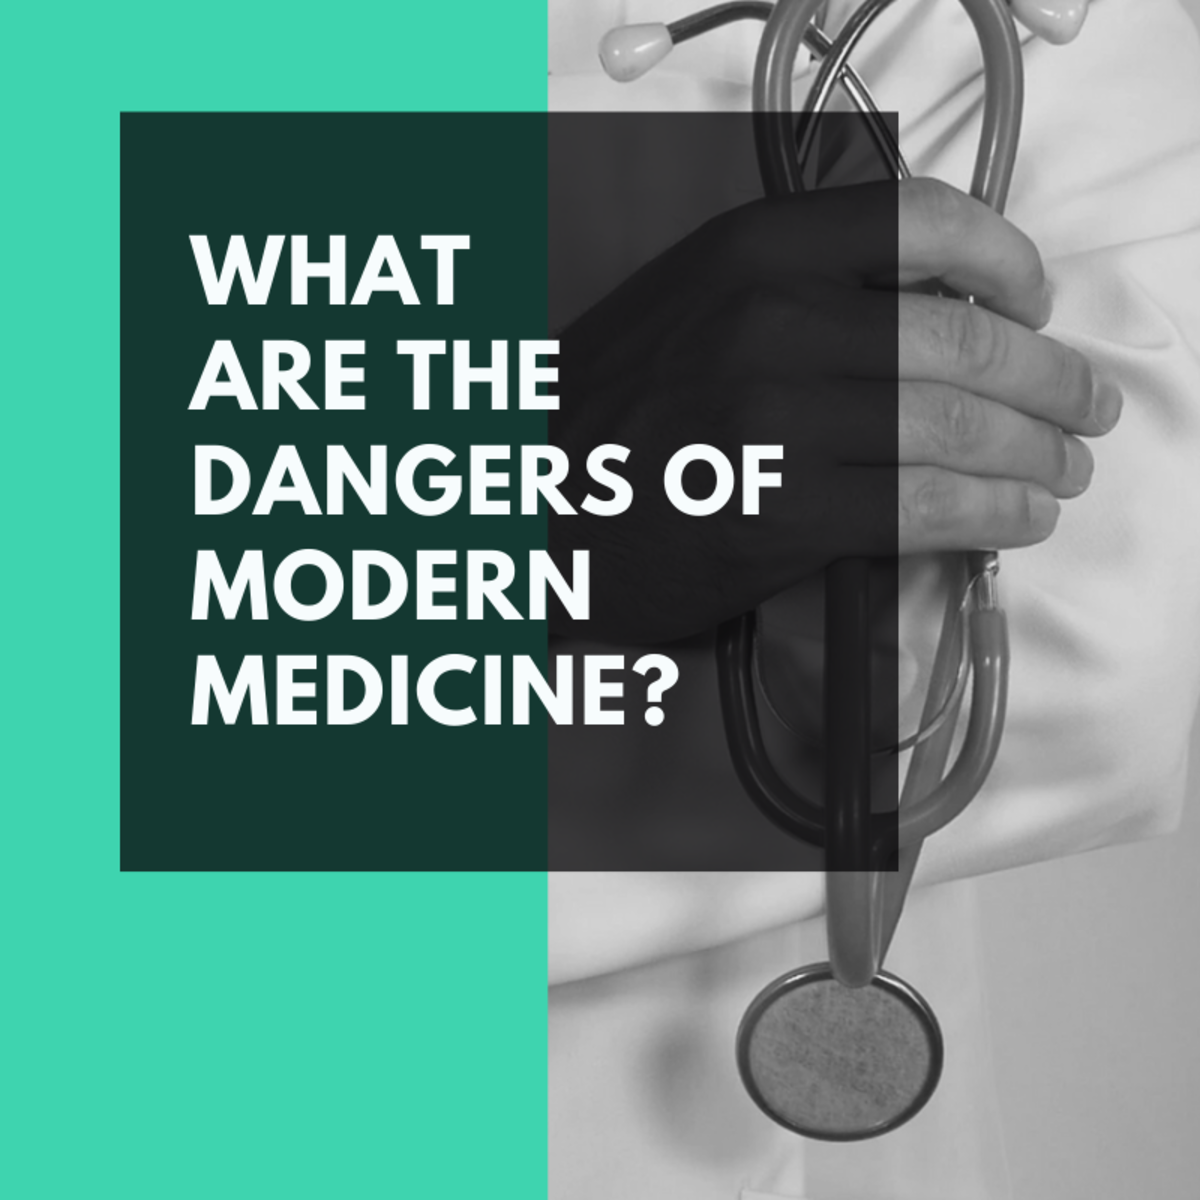 The Dangers of Modern Medicine